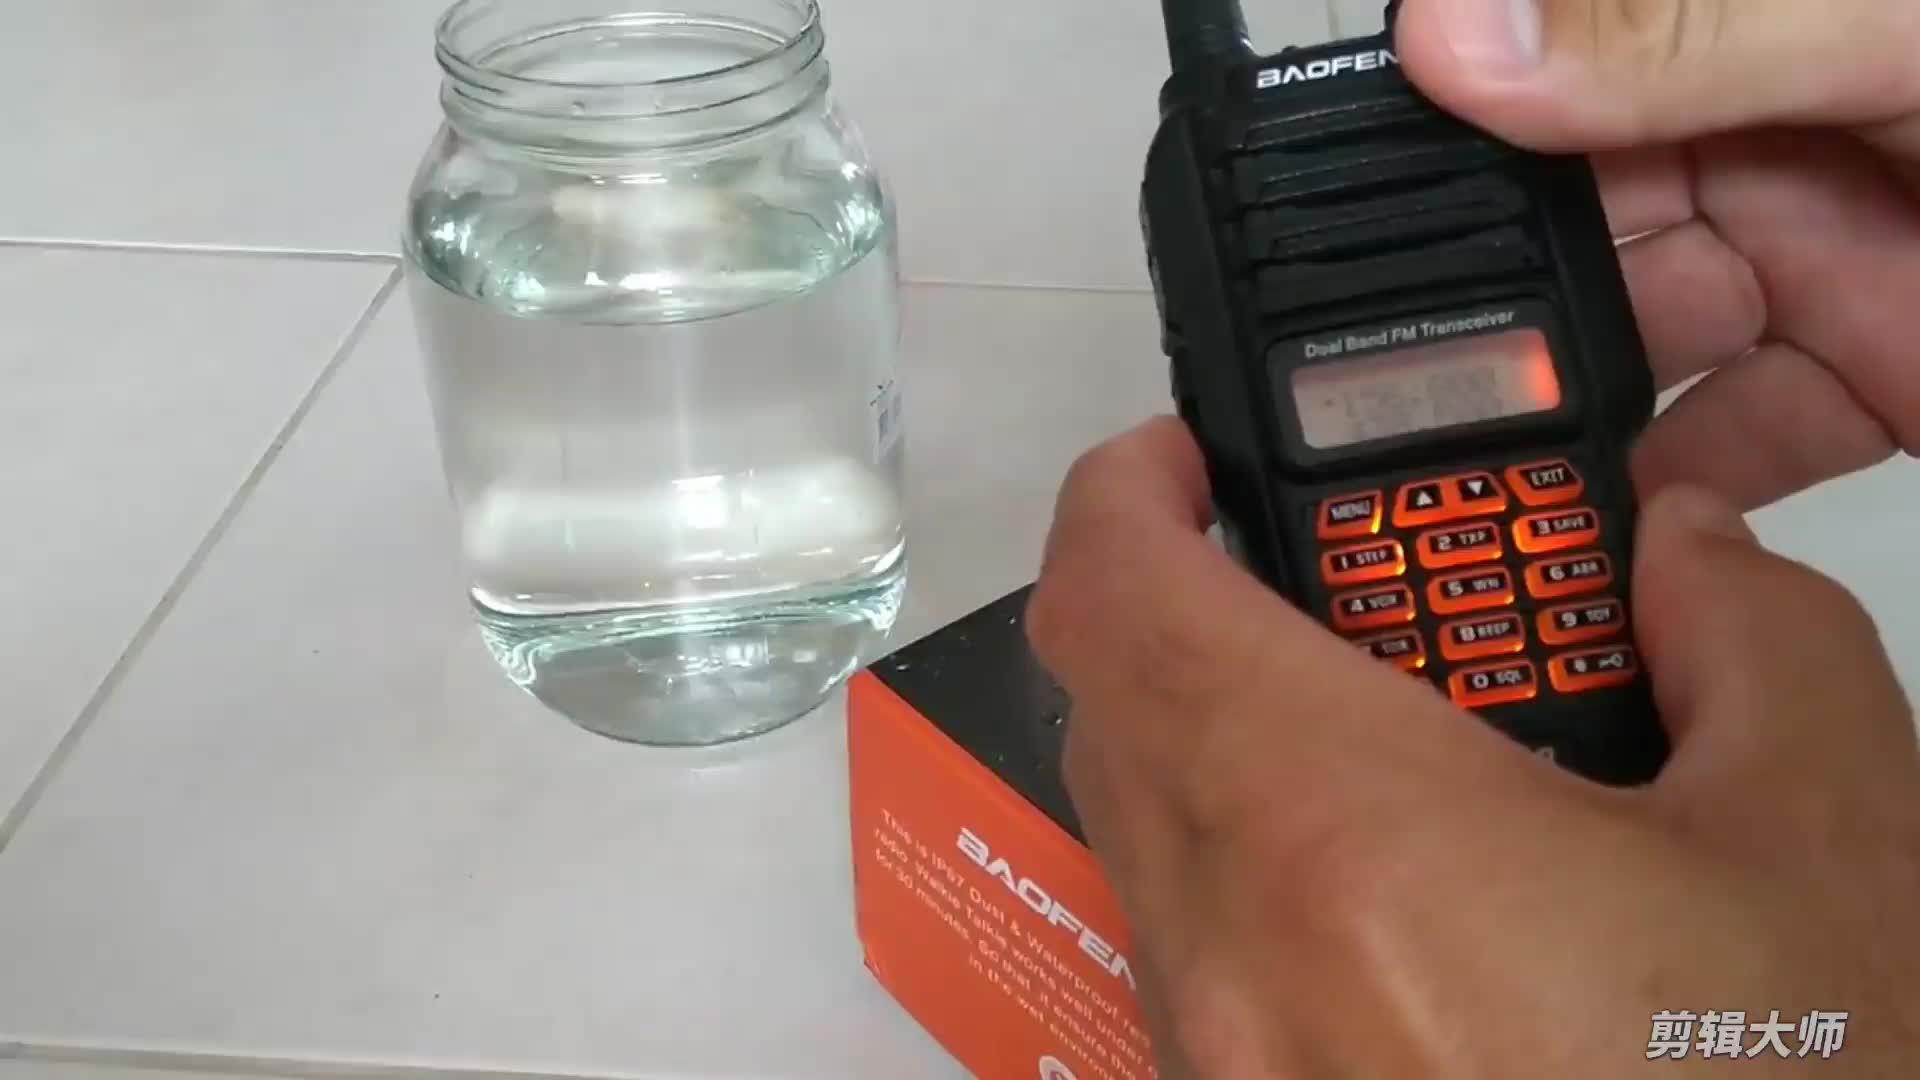 New Coming BAOFENG BF-9R waterproof radio,waterproof two way radio Wholesale from China